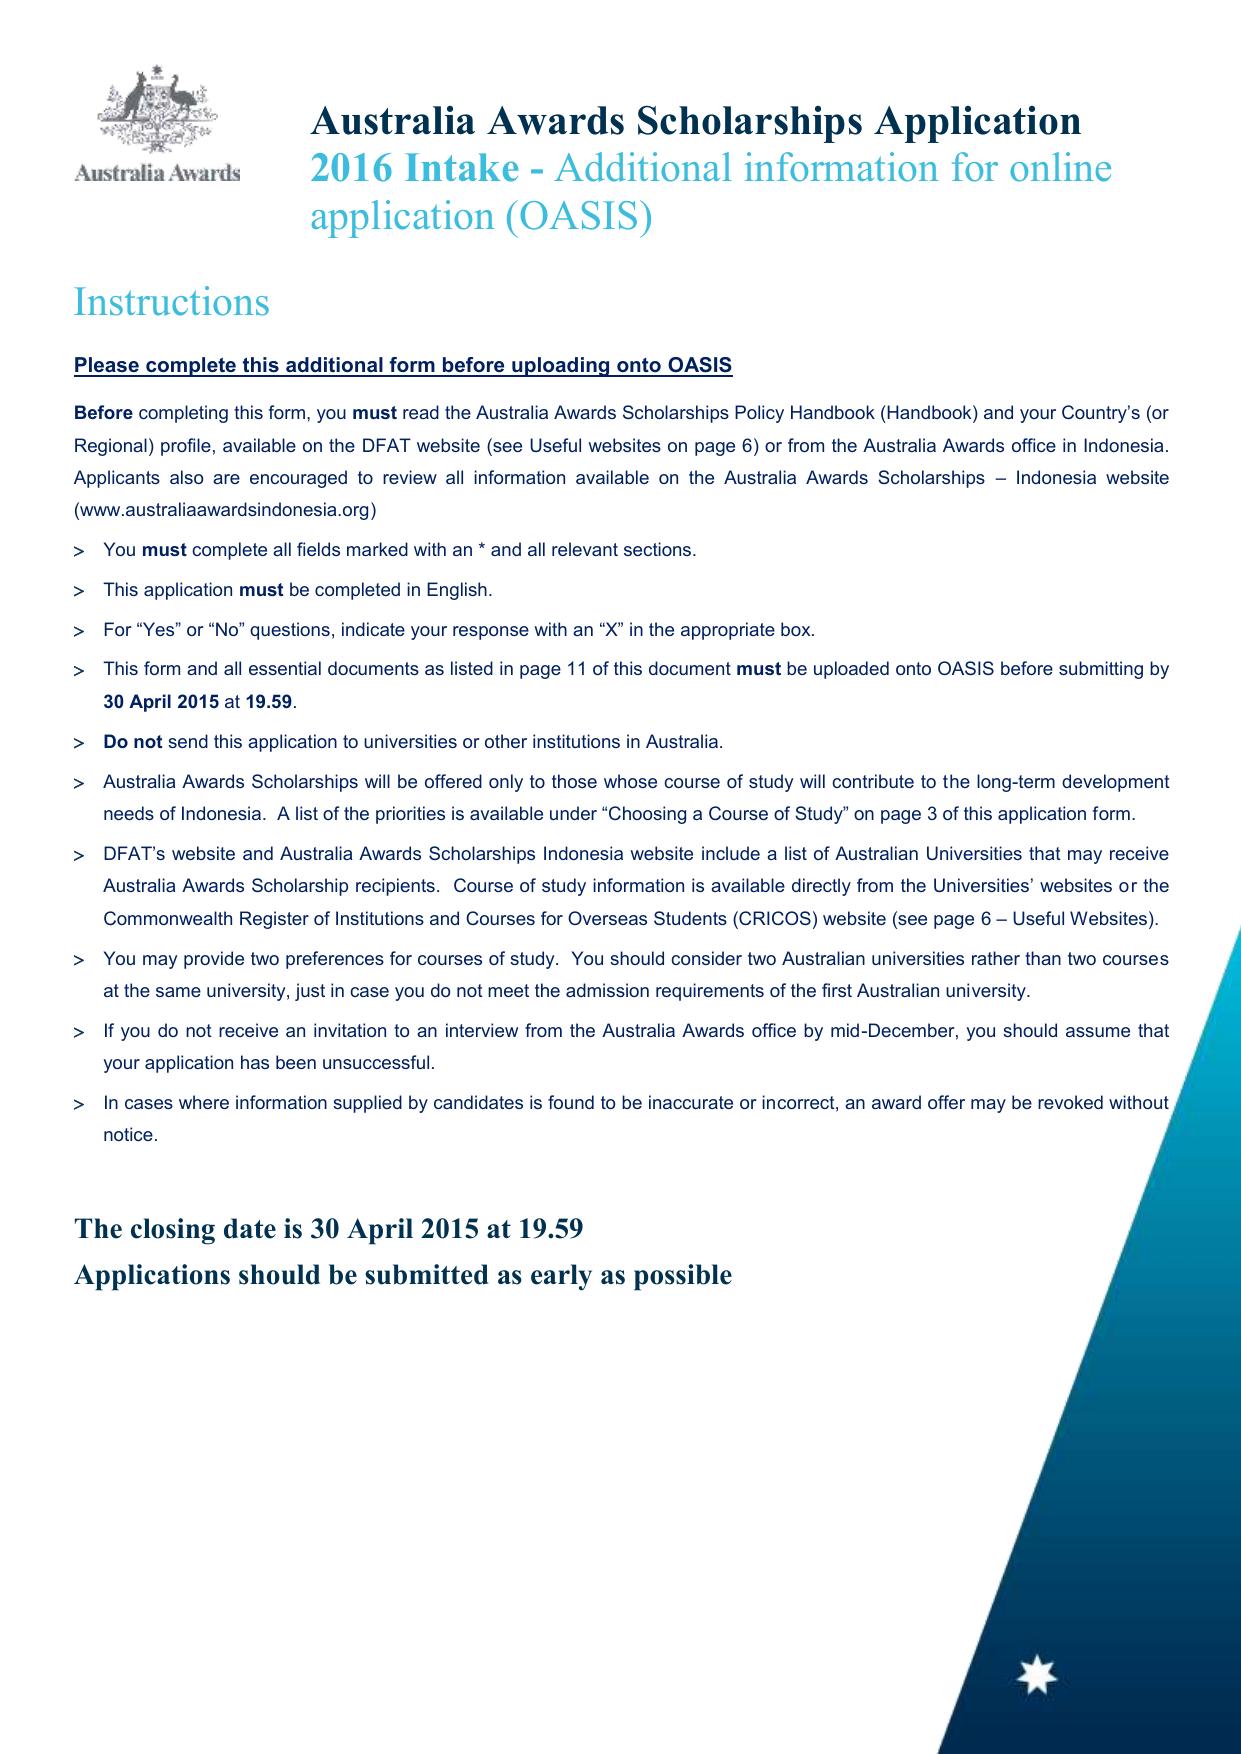 Australia Awards Scholarships 2016 Additional Form